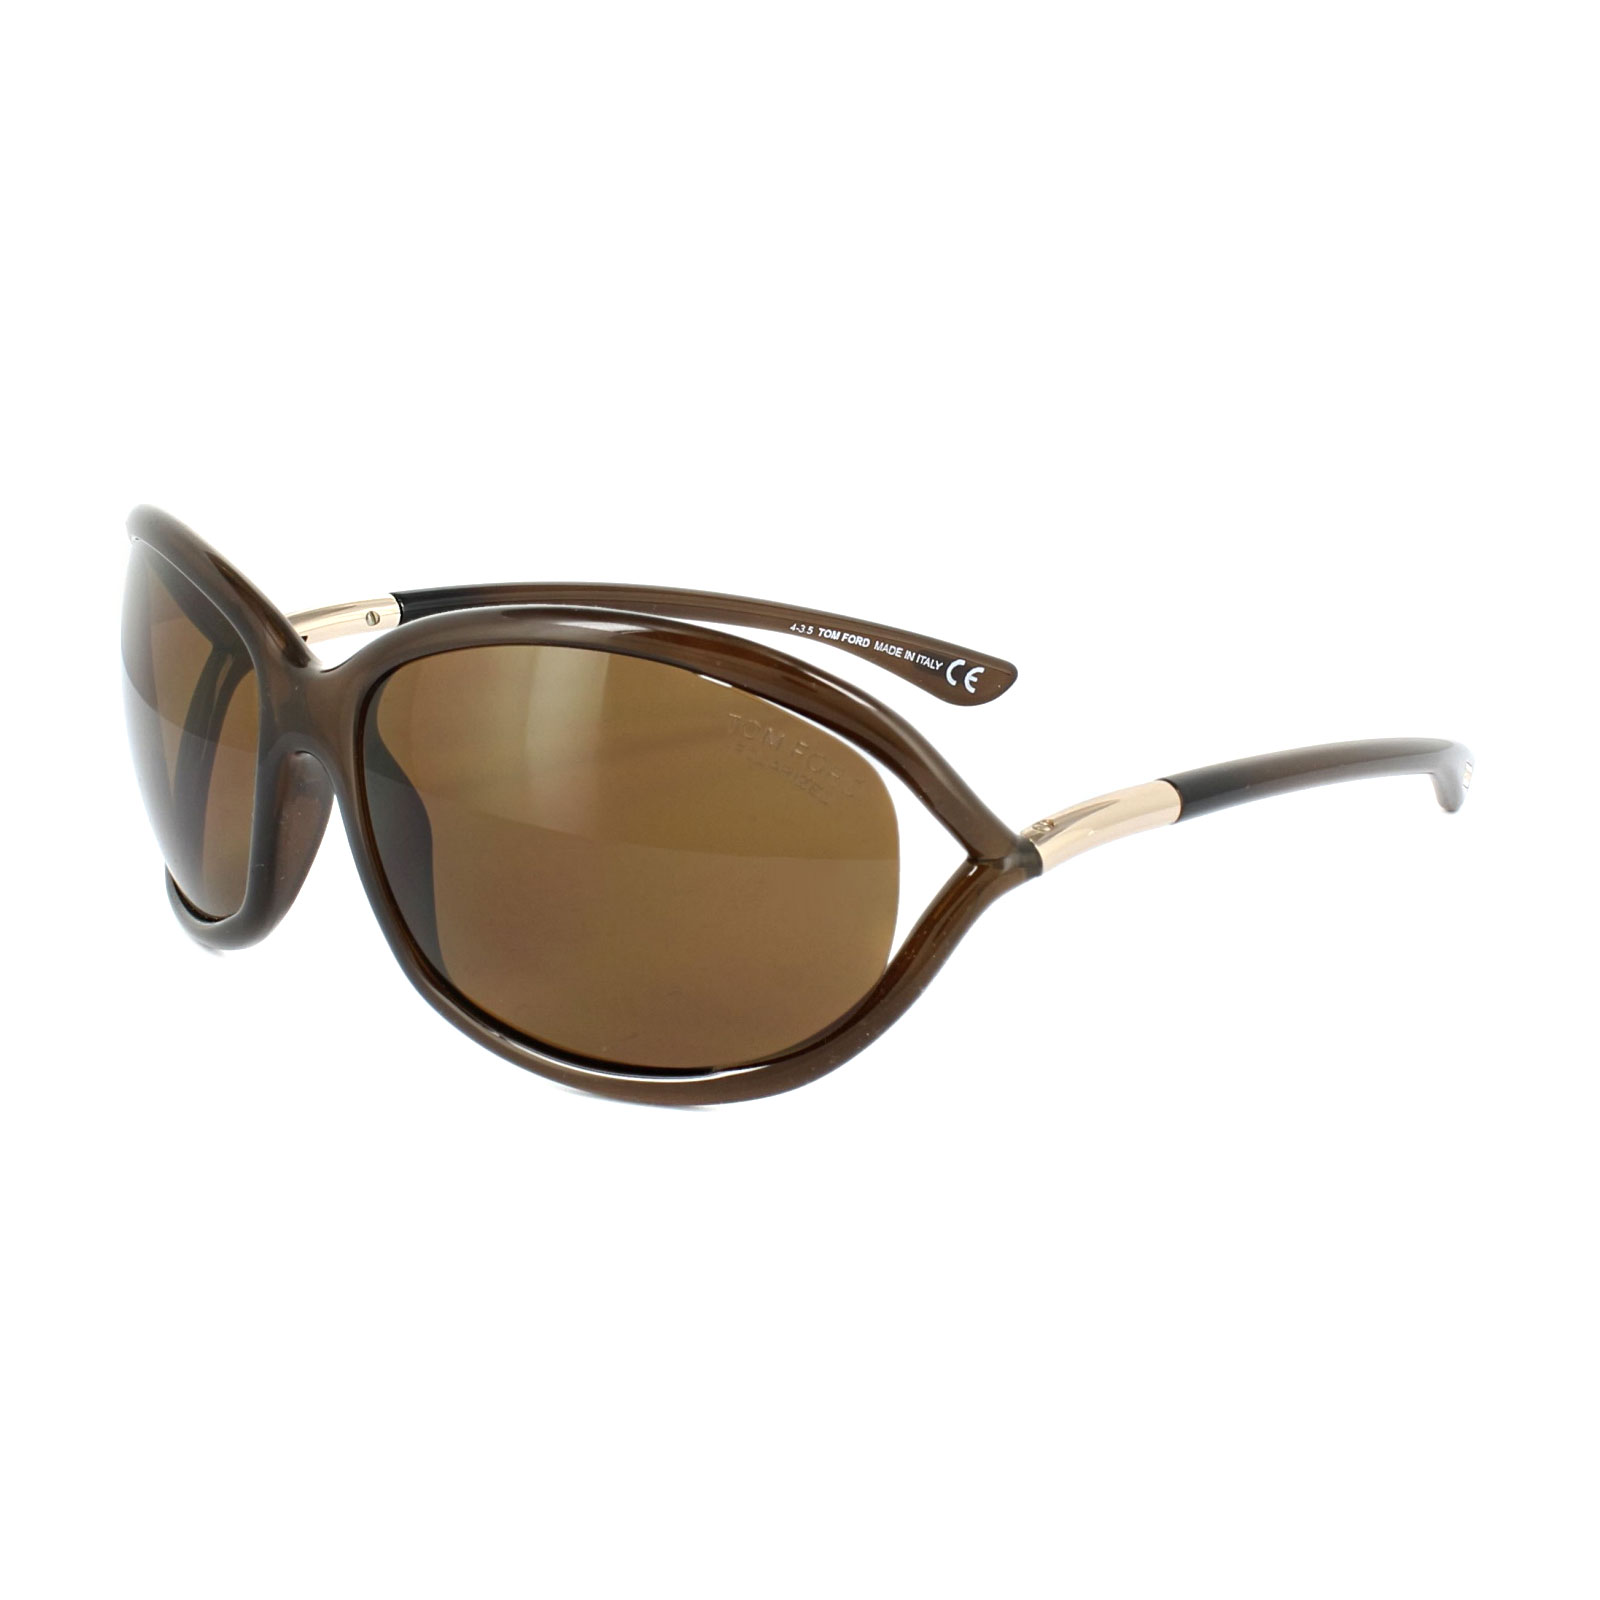 Tom Ford Damen Sonnenbrille »Jennifer FT0008«, braun, 48H - braun/braun